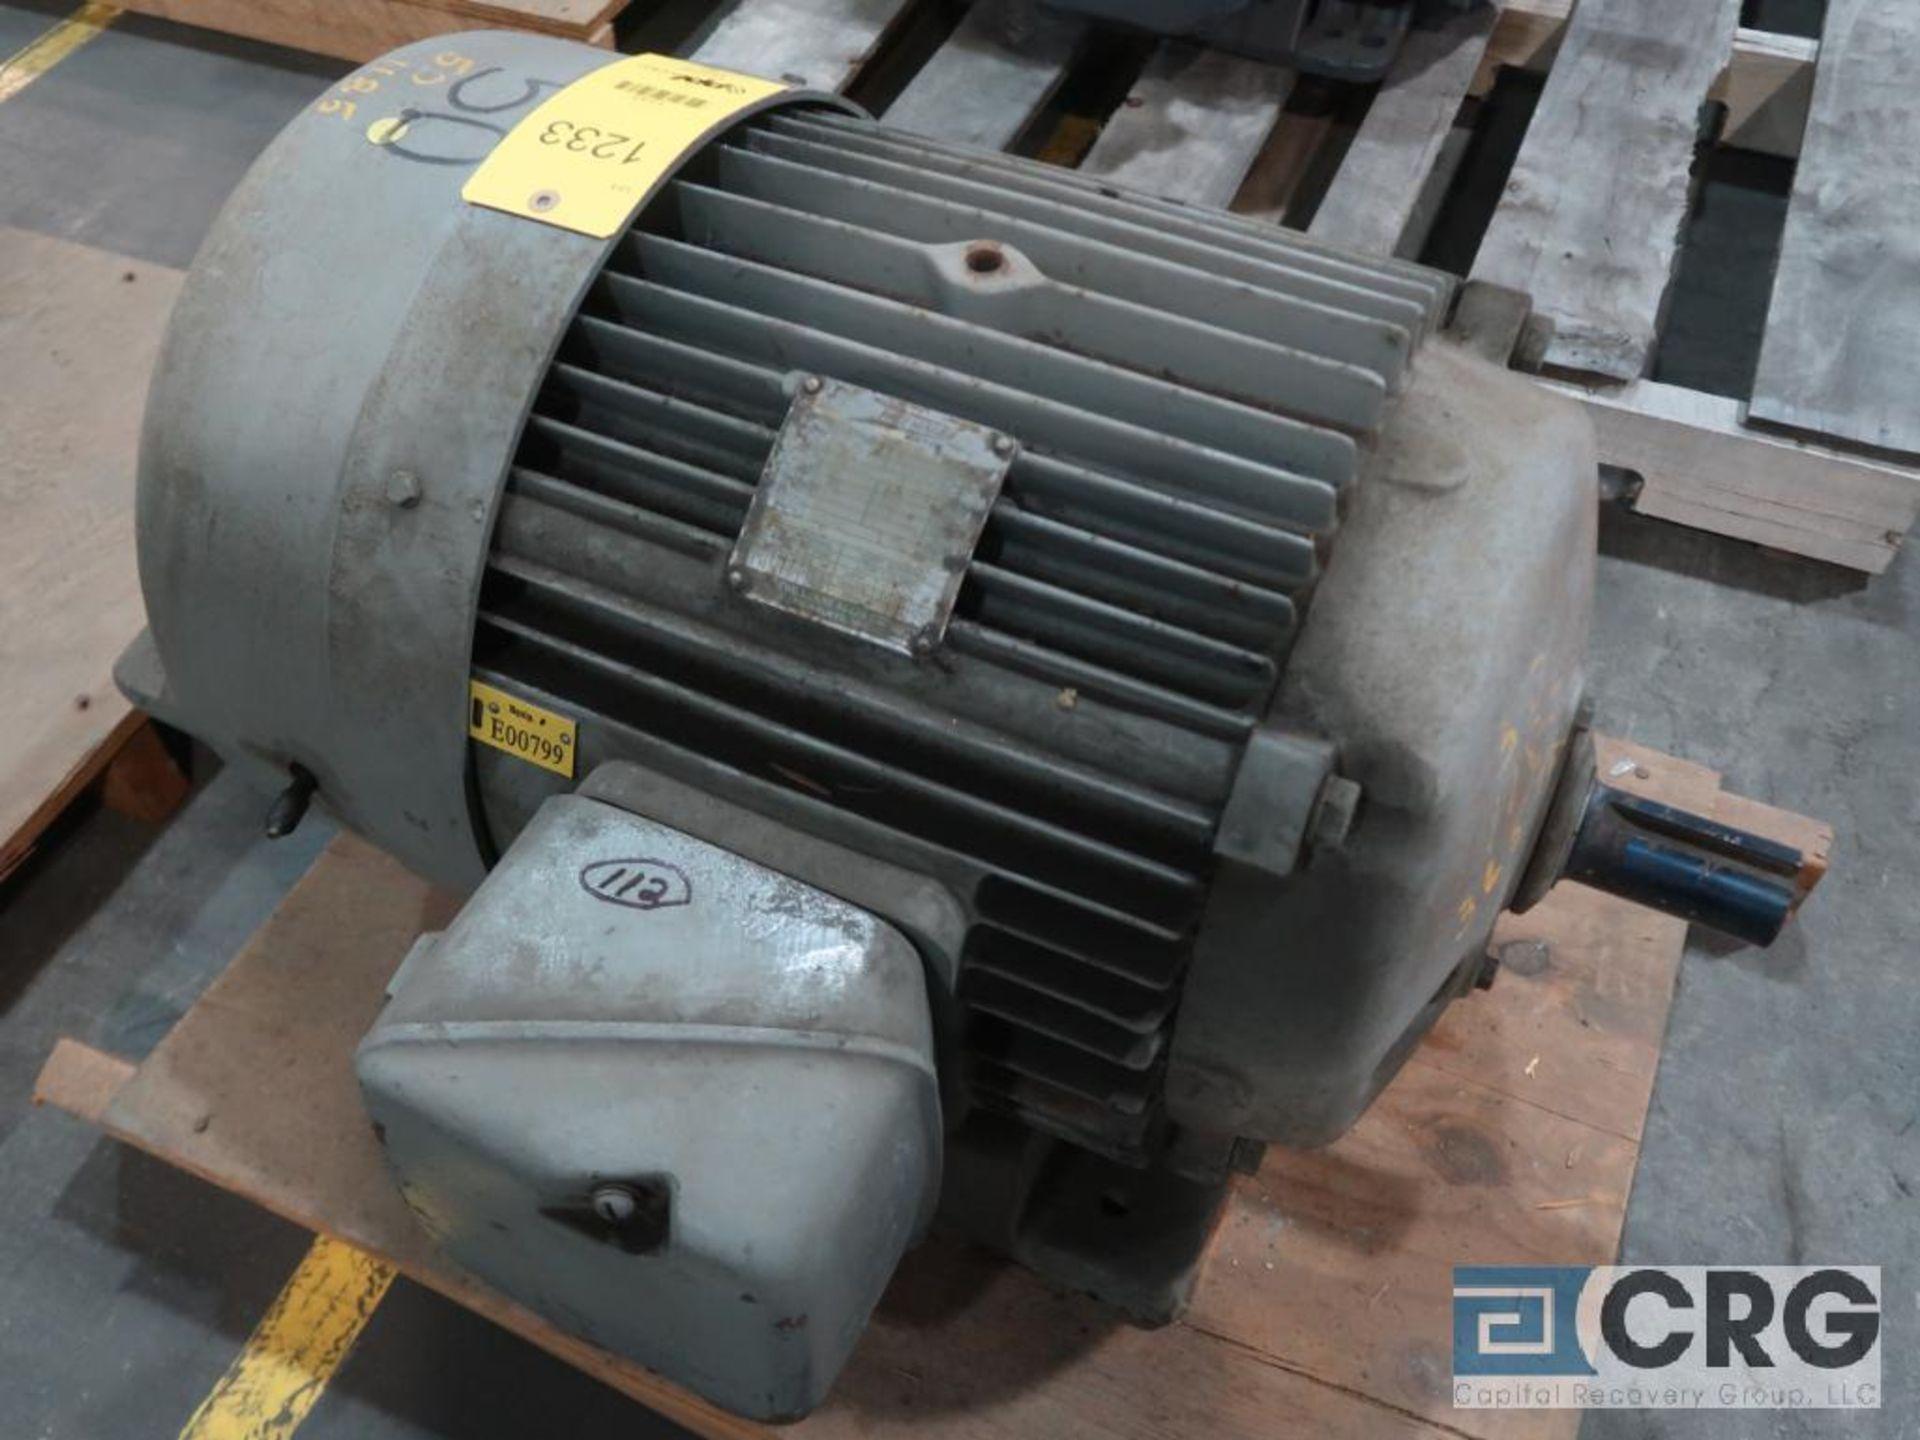 Louis-Allis Pacemaker motor, 50 HP, 1,185 RPMs, 230/460 volt, 3 ph., 365TS frame (Finish Building)